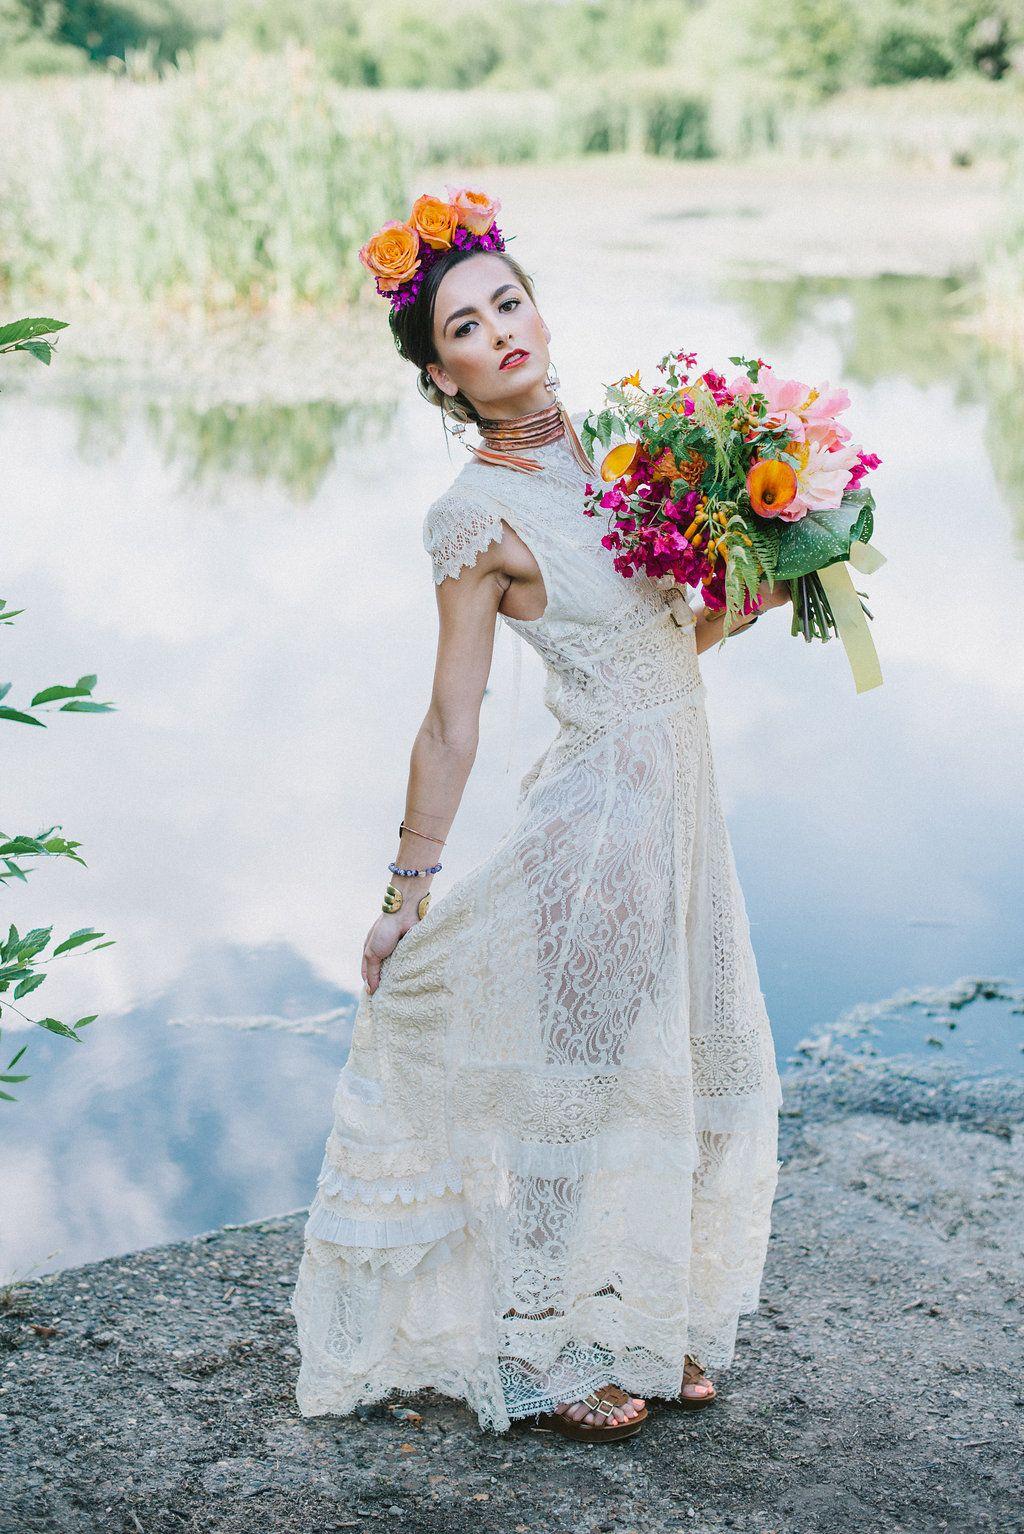 upcycled frida kahlo inspired wedding dress by crystena hemingway